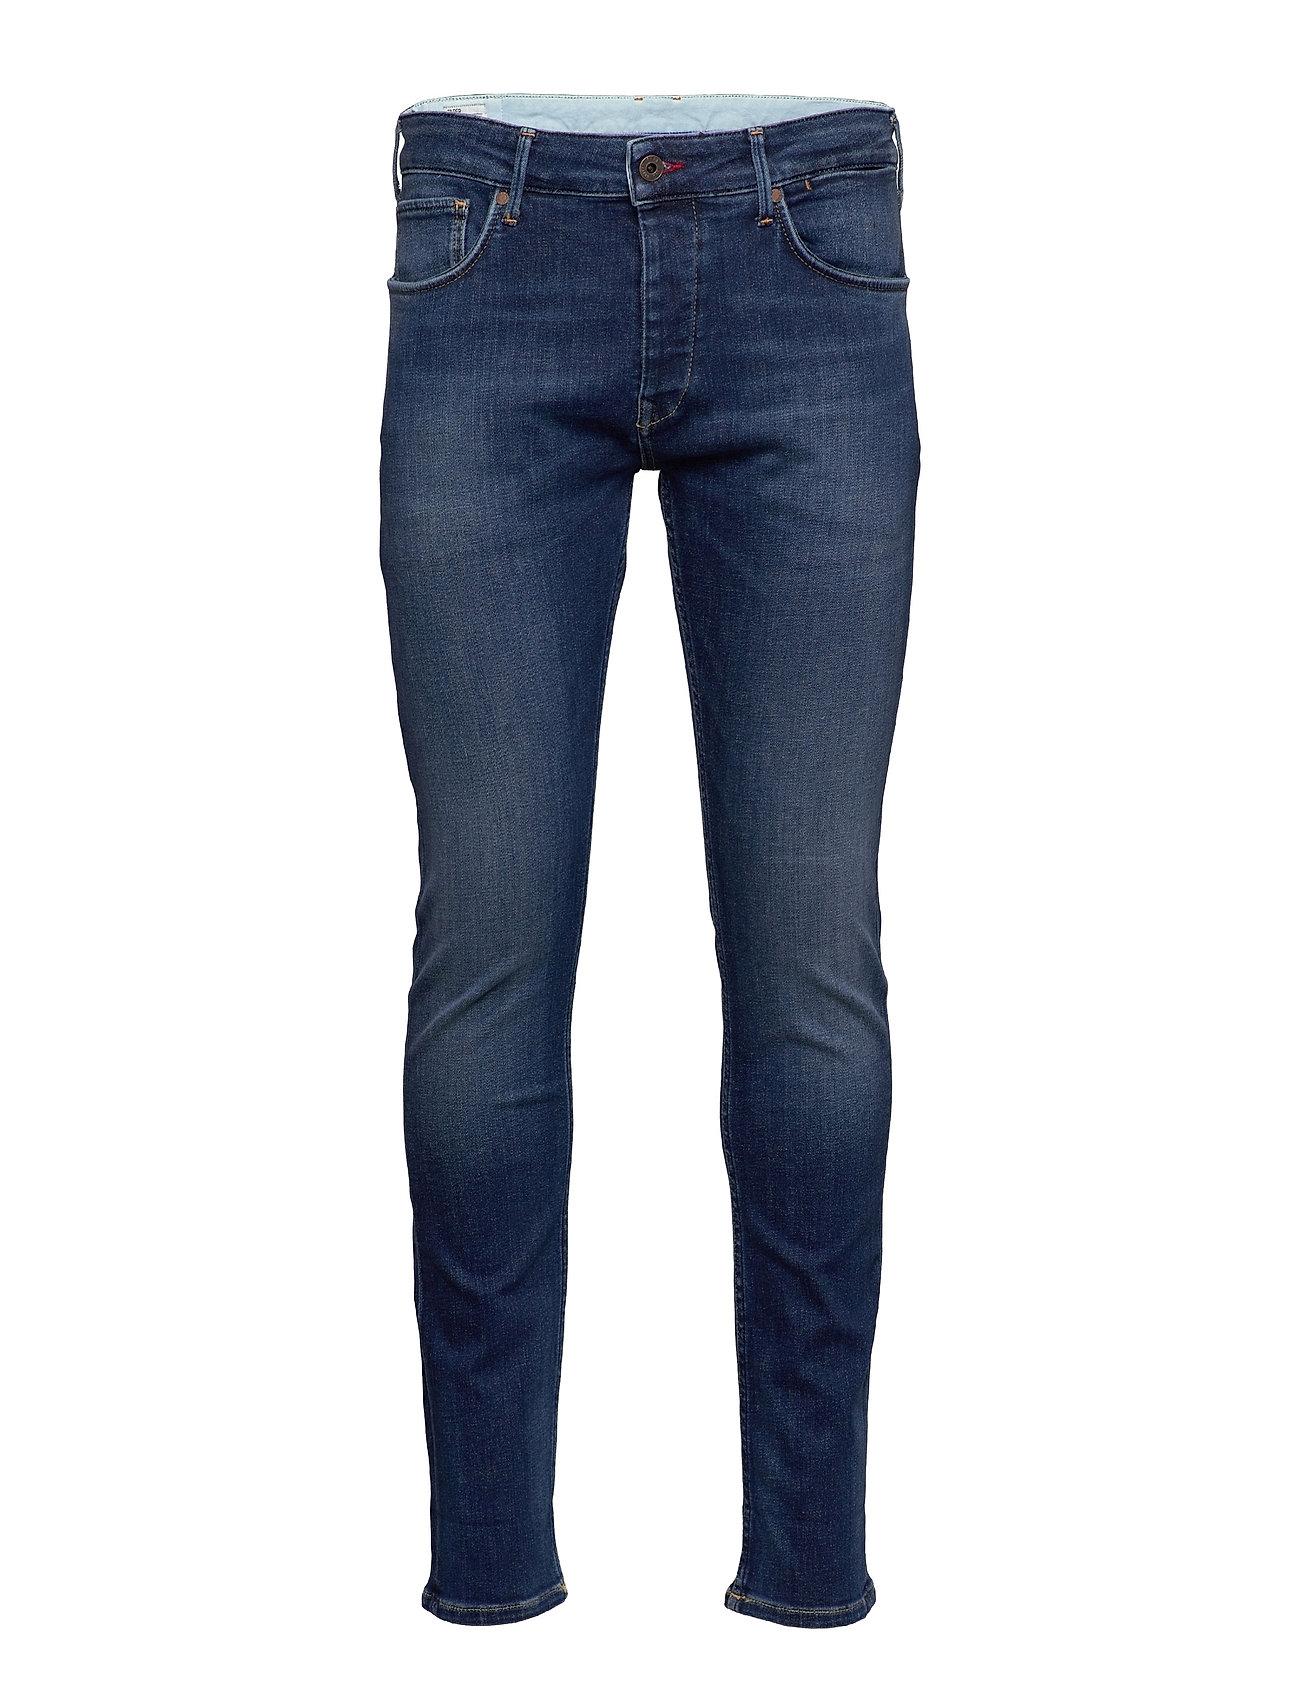 Stanley 2020 Jeans Blå Pepe Jeans London